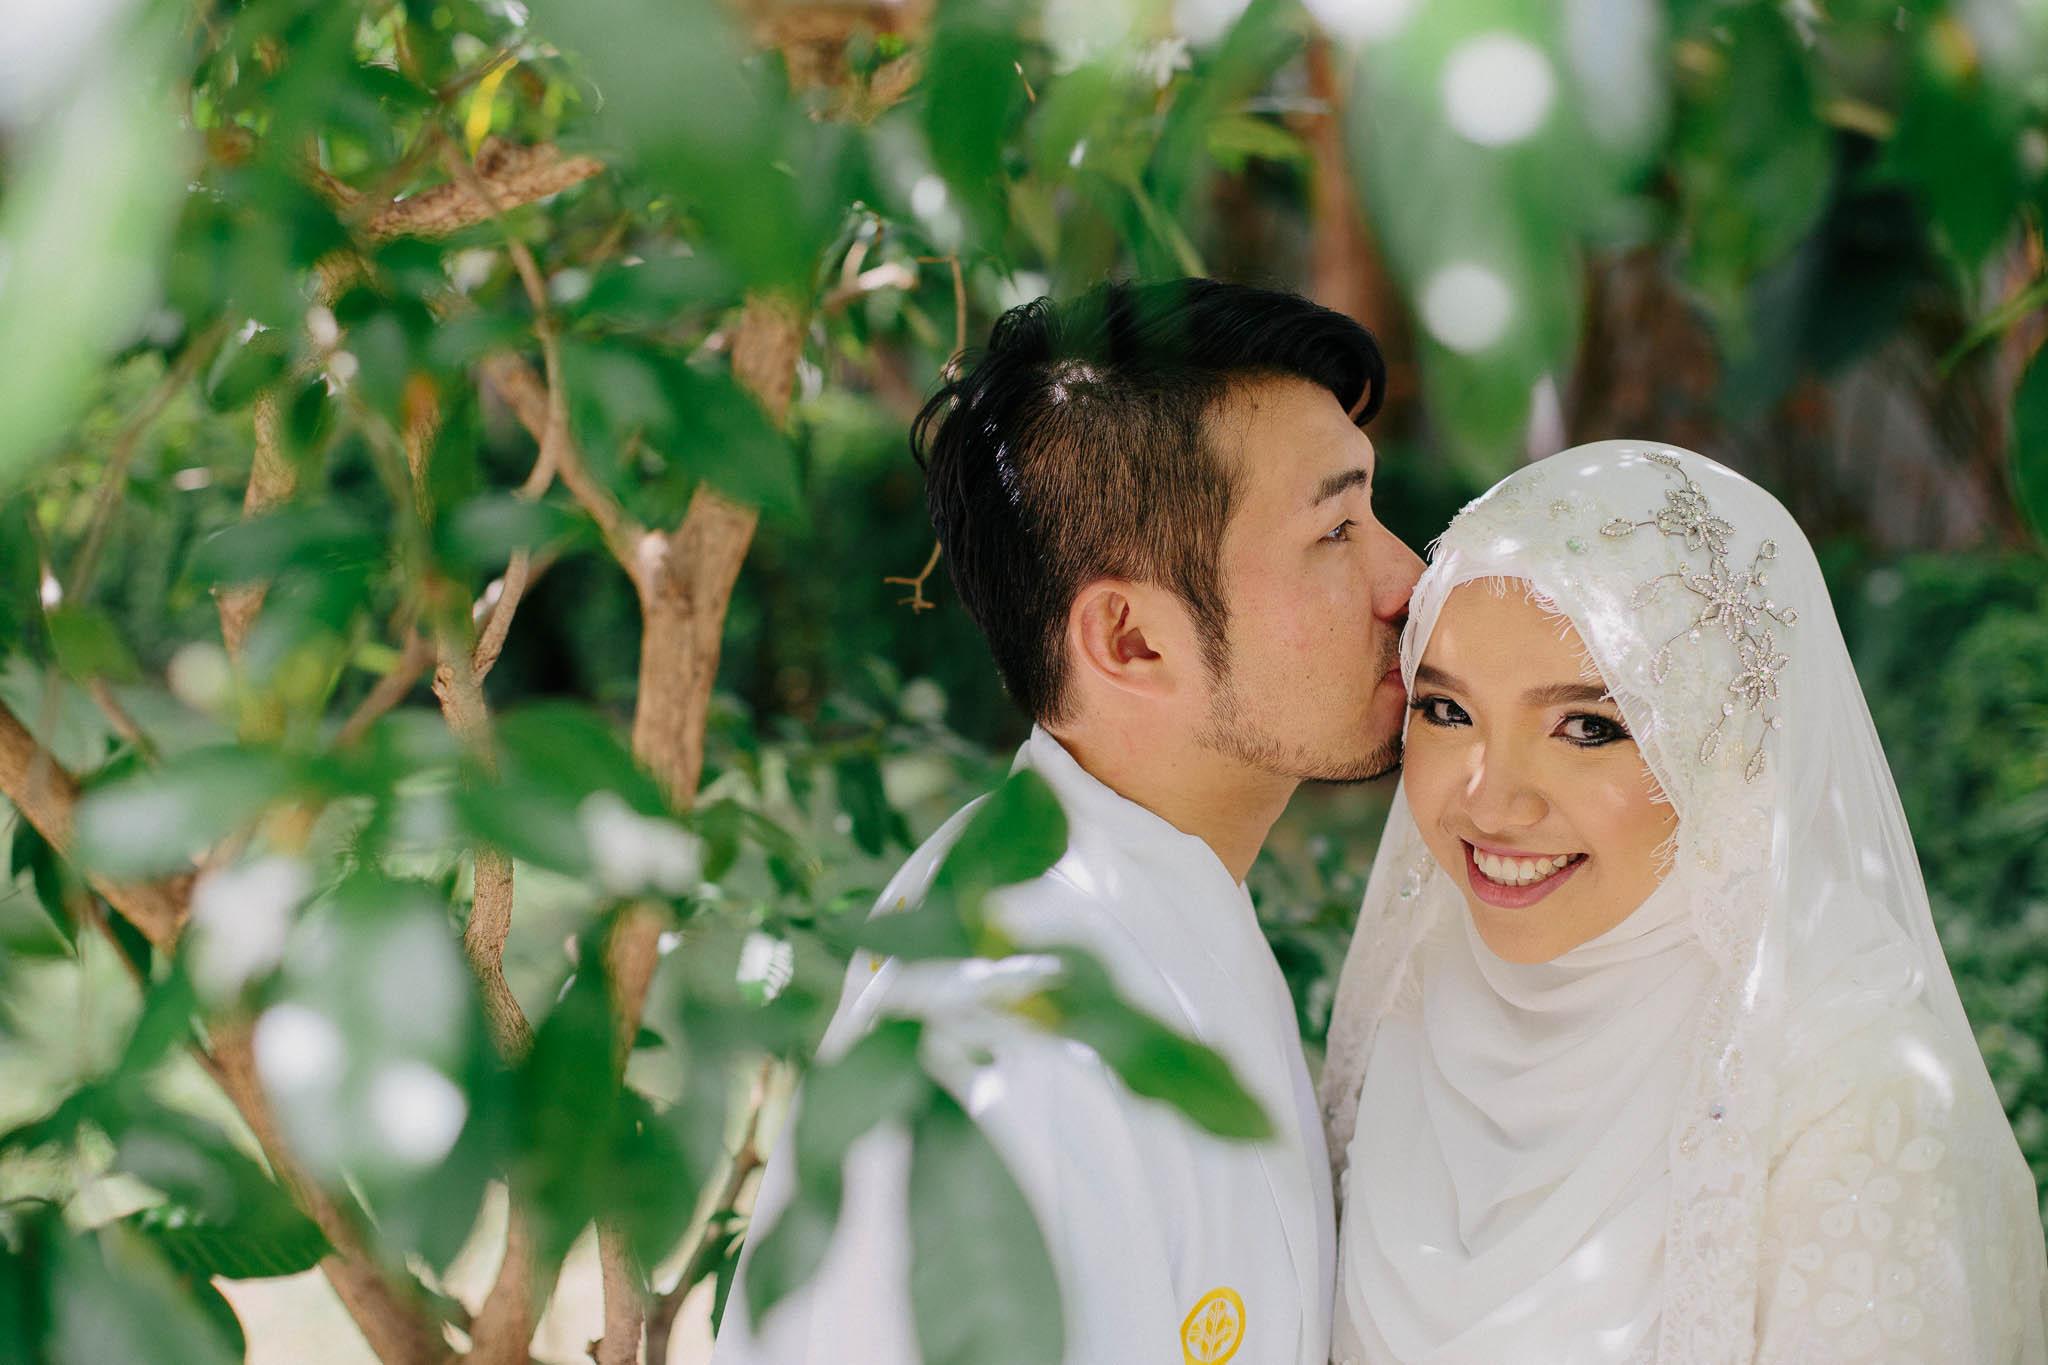 singapore-wedding-photographer-malay-indian-pre-wedding-travel-wmt-2015-19.jpg